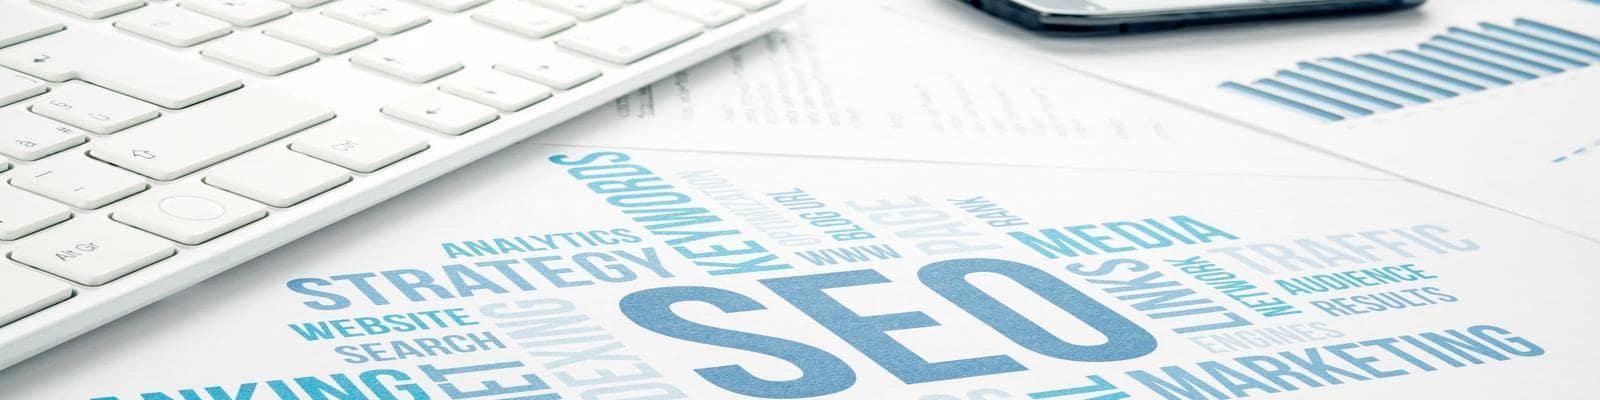 SEO-search engine marketing agency